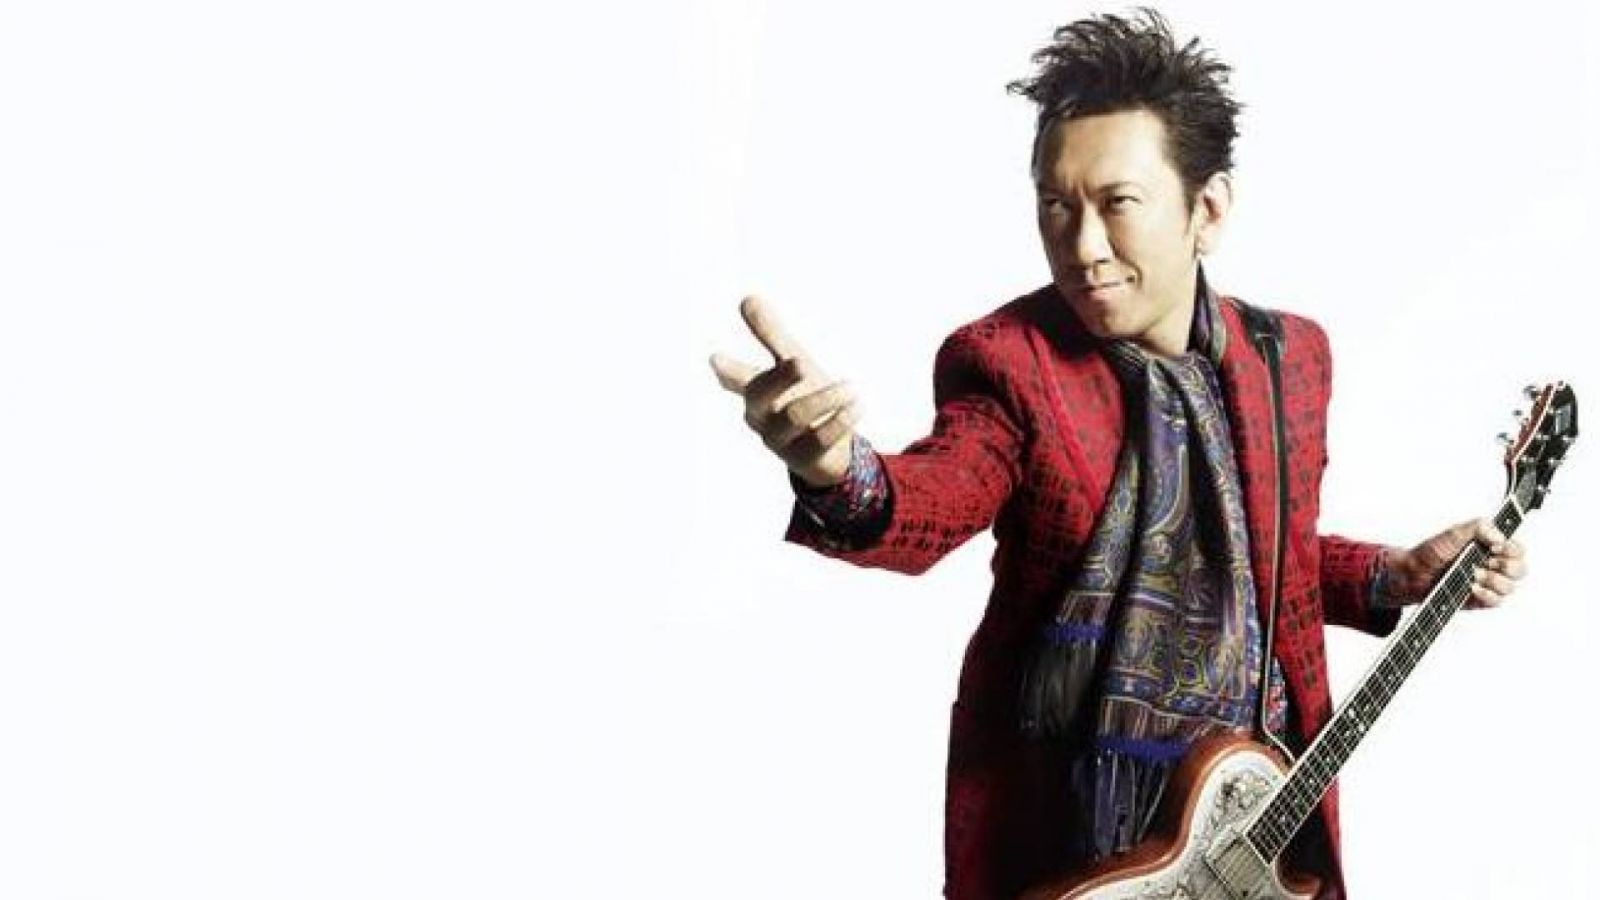 Три концерта Tomoyasu Hotei © IRc2 CORPORATION